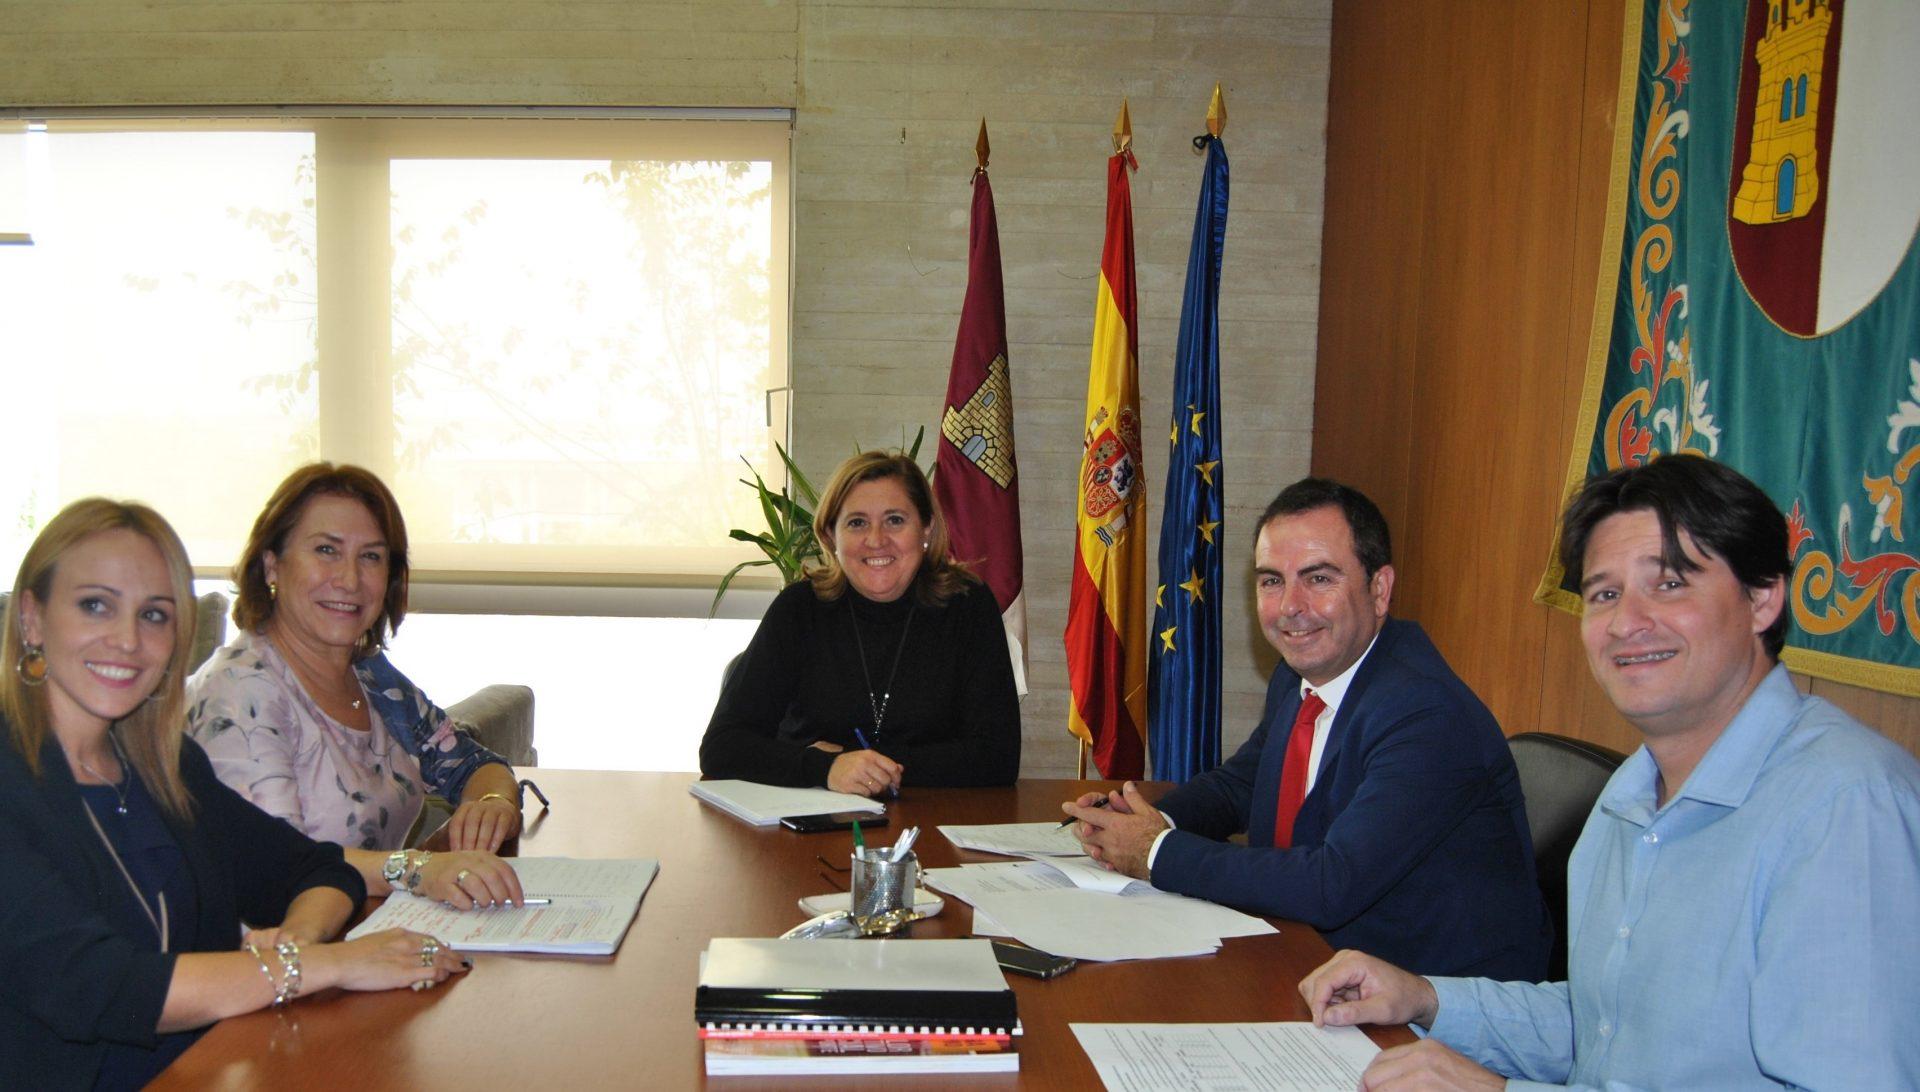 Reunión consejera educación-alcaldesa Bargas-2